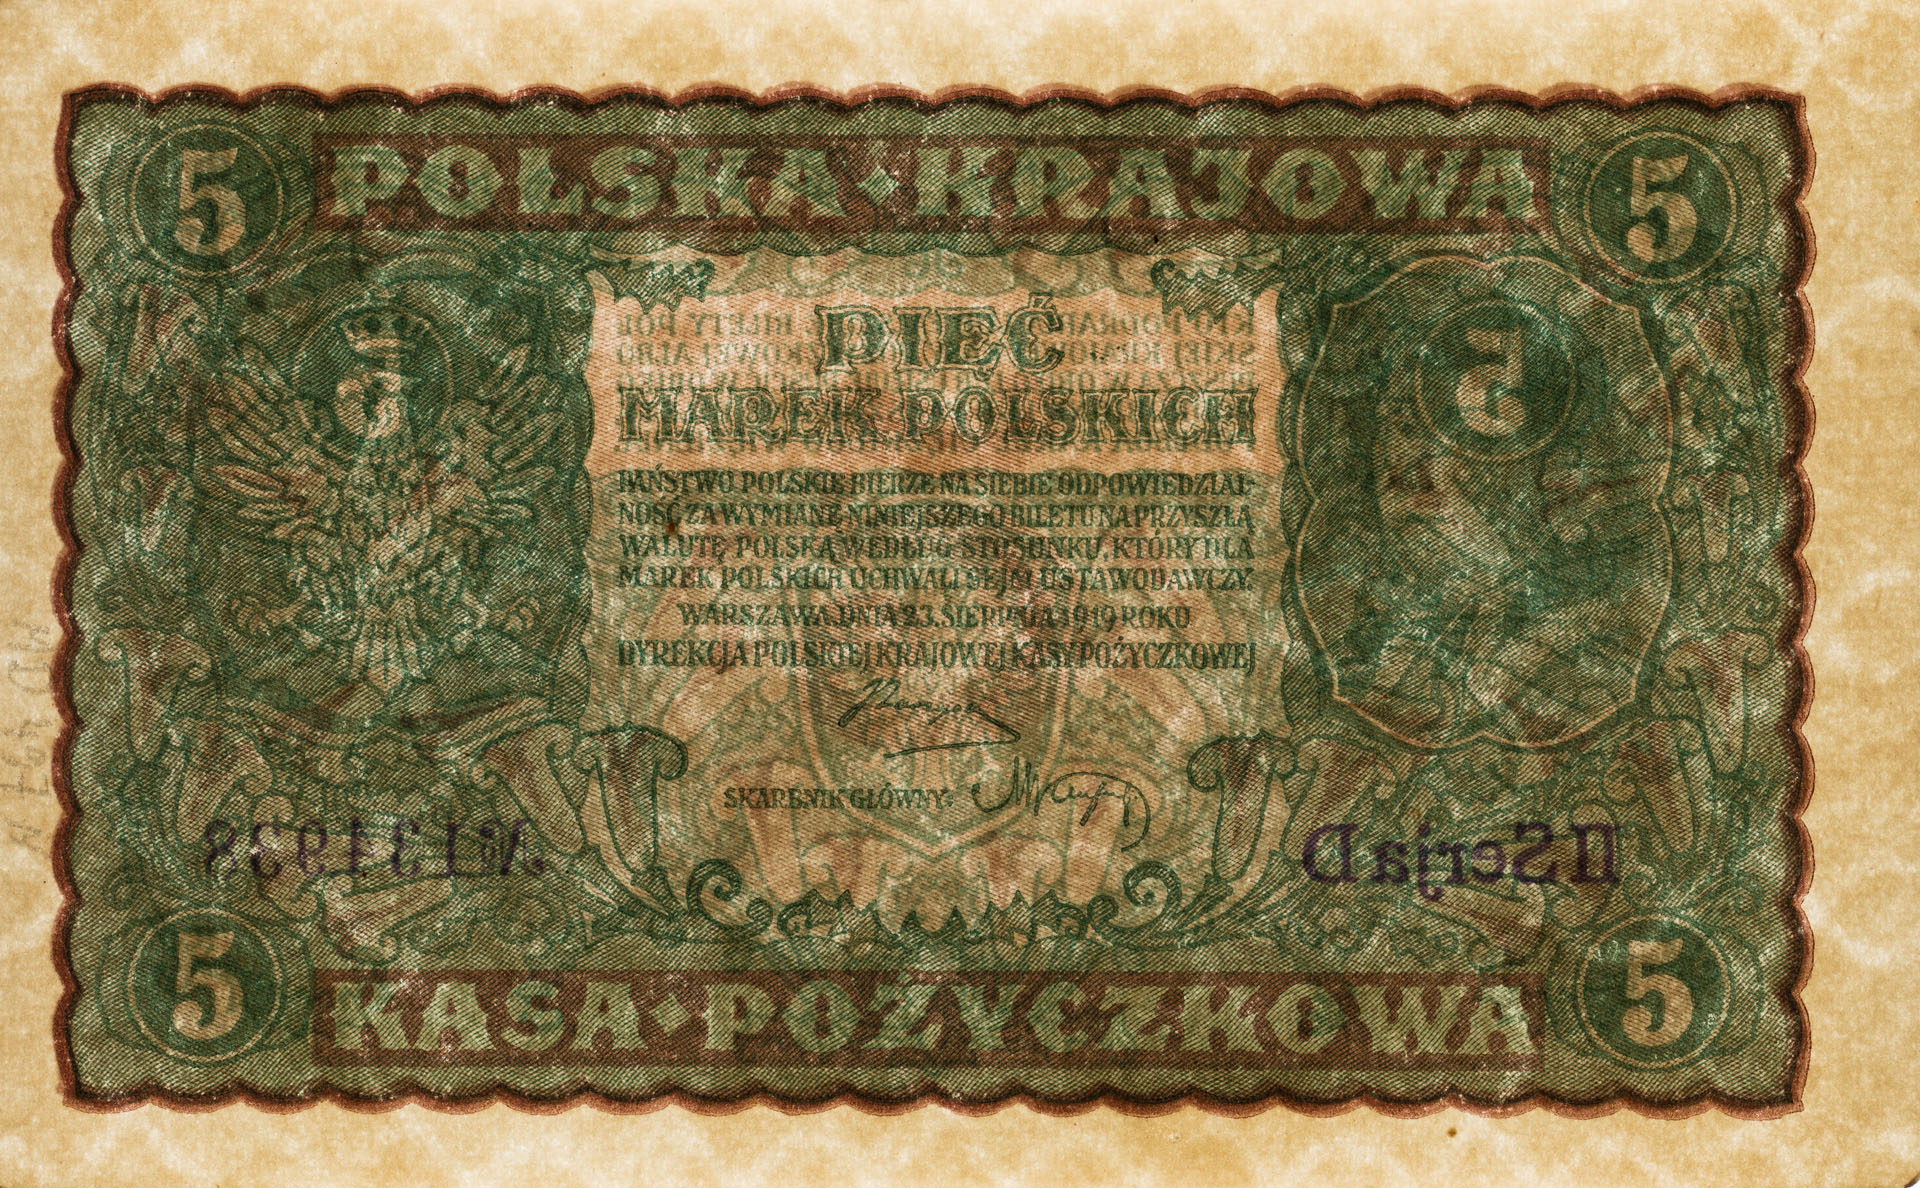 Banknot 5 marek polskich